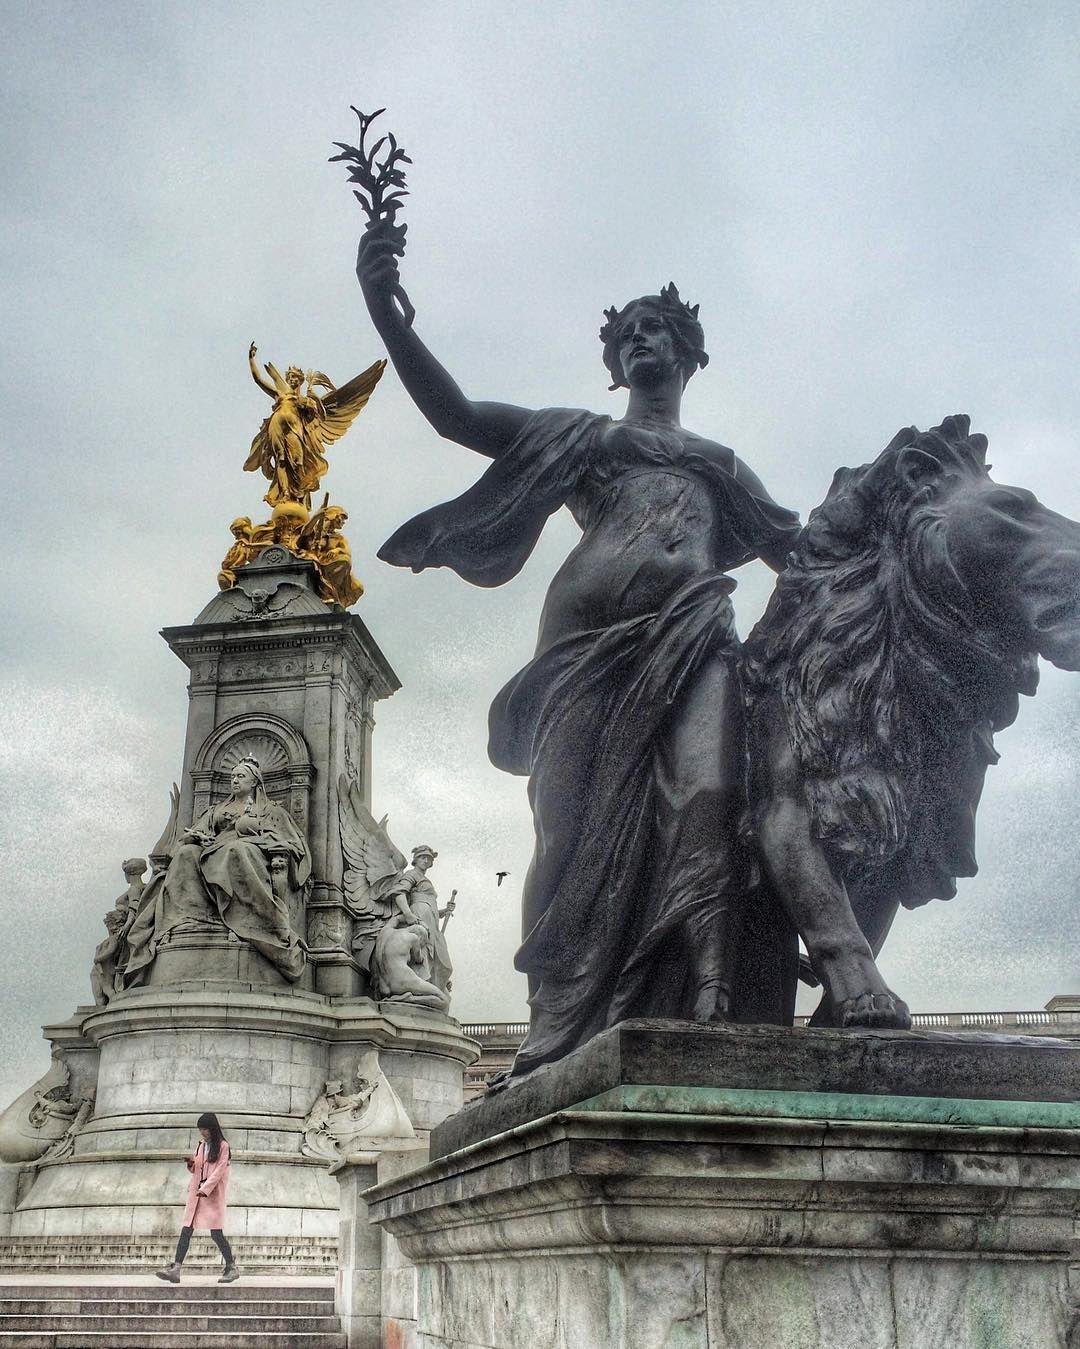 Some lovely ladies at #buckinghampalace #statue #badasswomenofhistory #women #travel #wanderlust #greyskiesinengland #london by sprayonhair